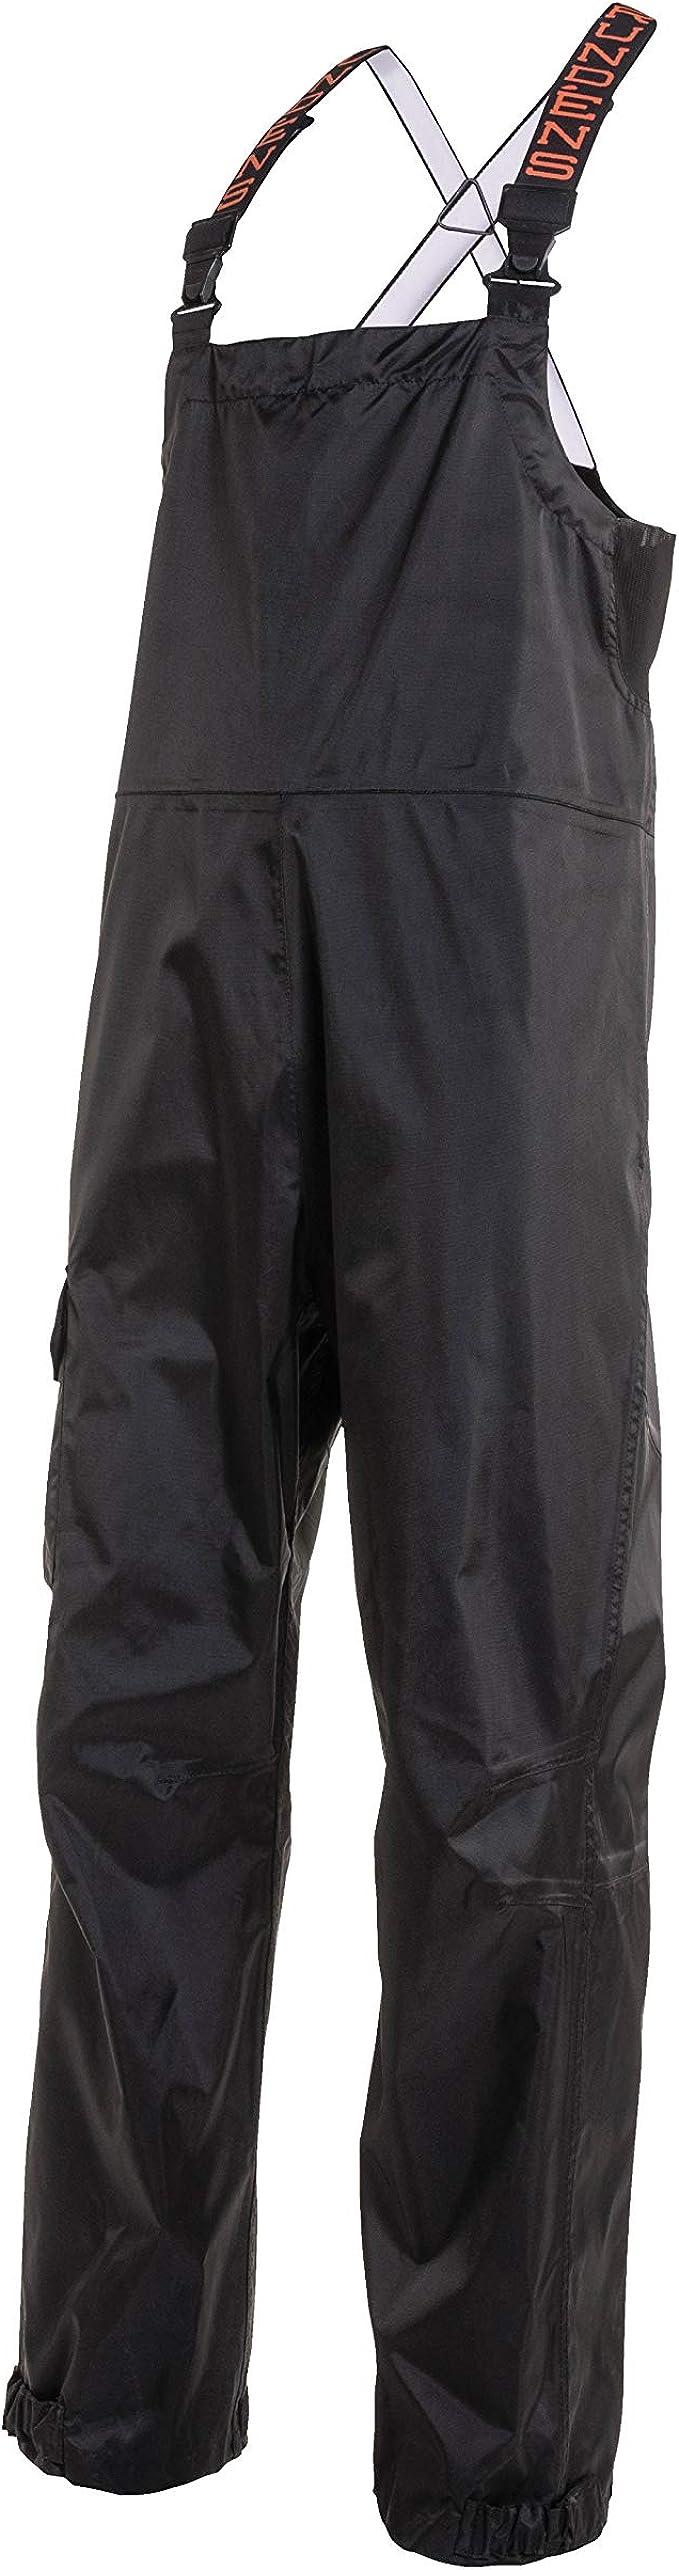 Grundens Weather Watch Fishing Bib Trousers